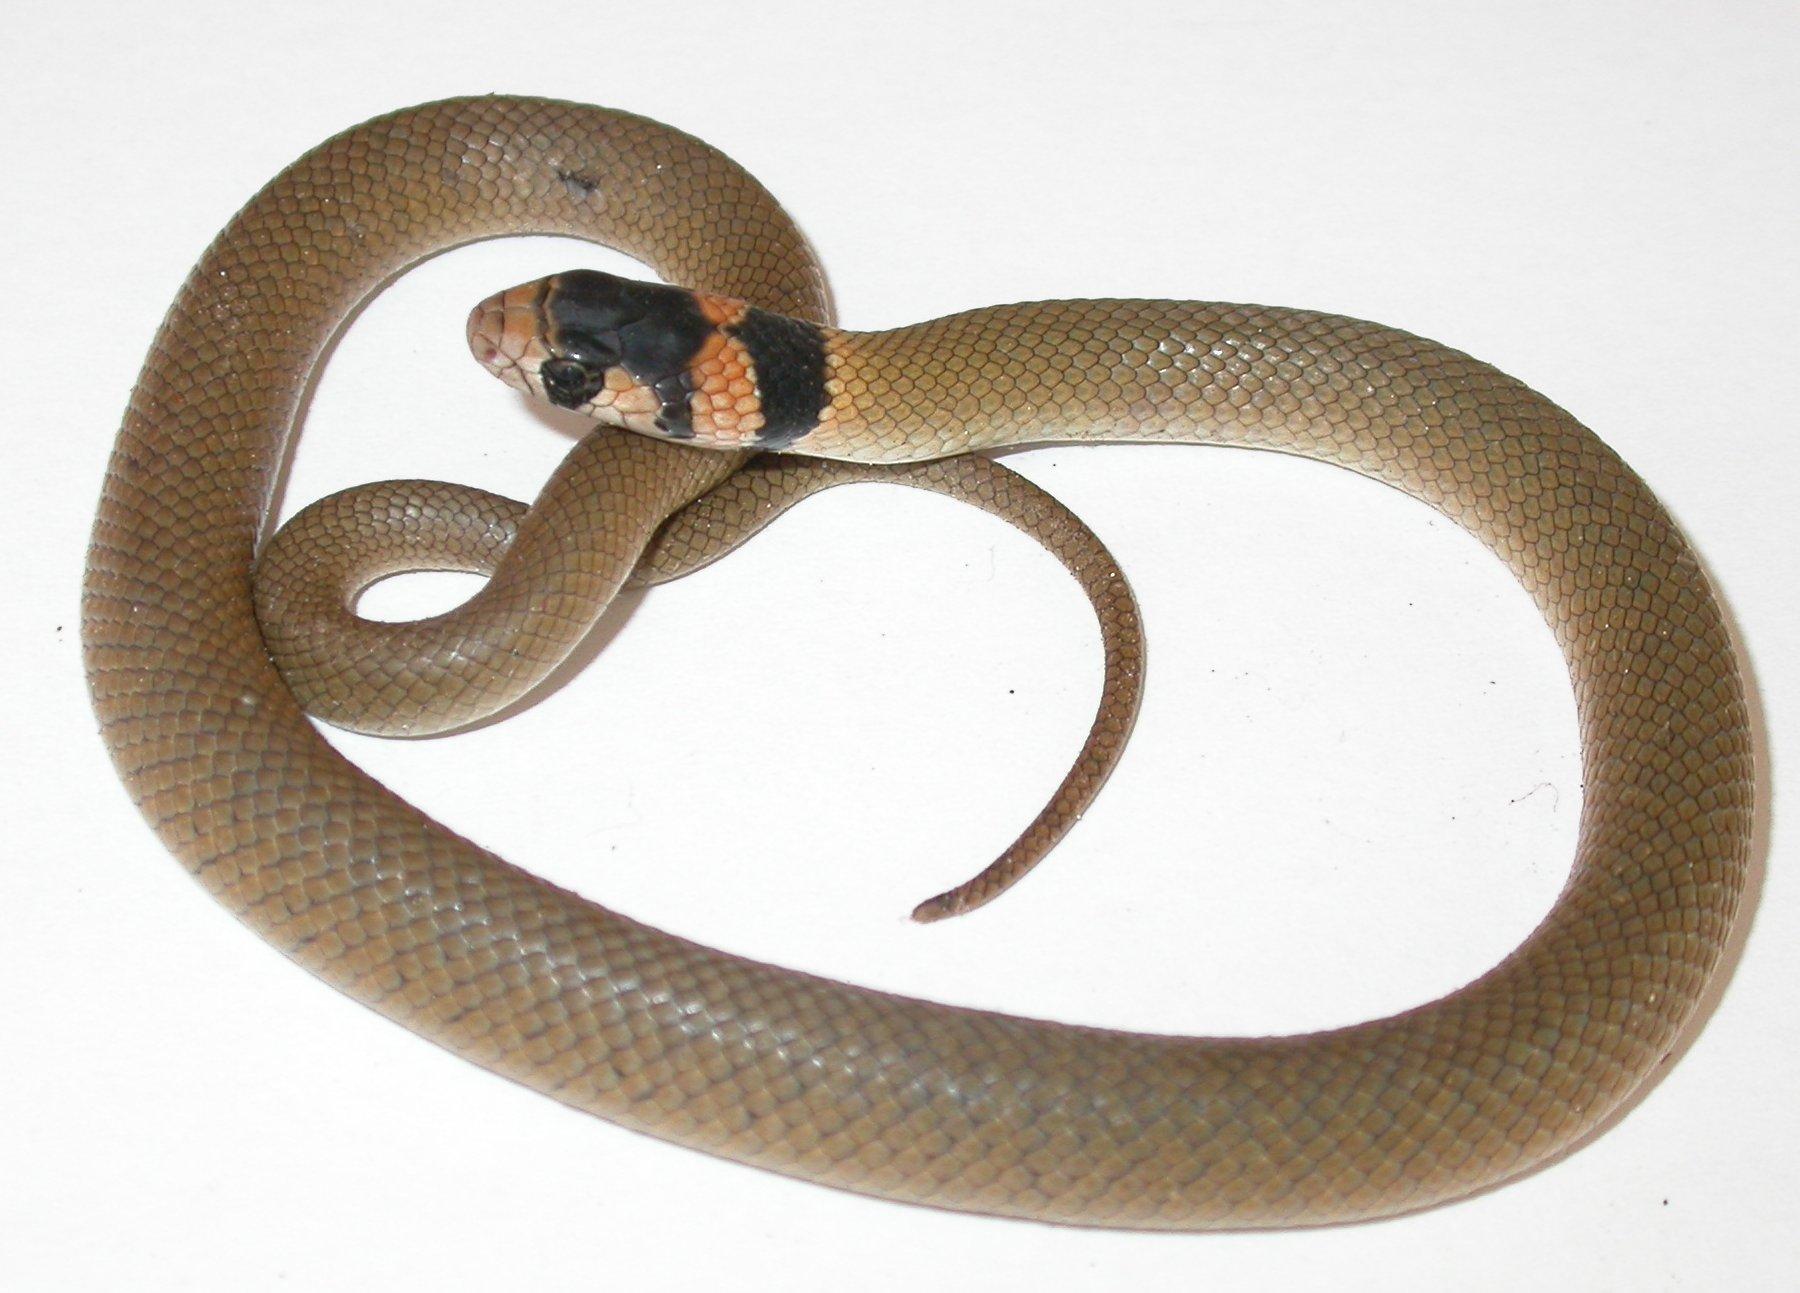 hawaii brown snakes - HD1800×1293